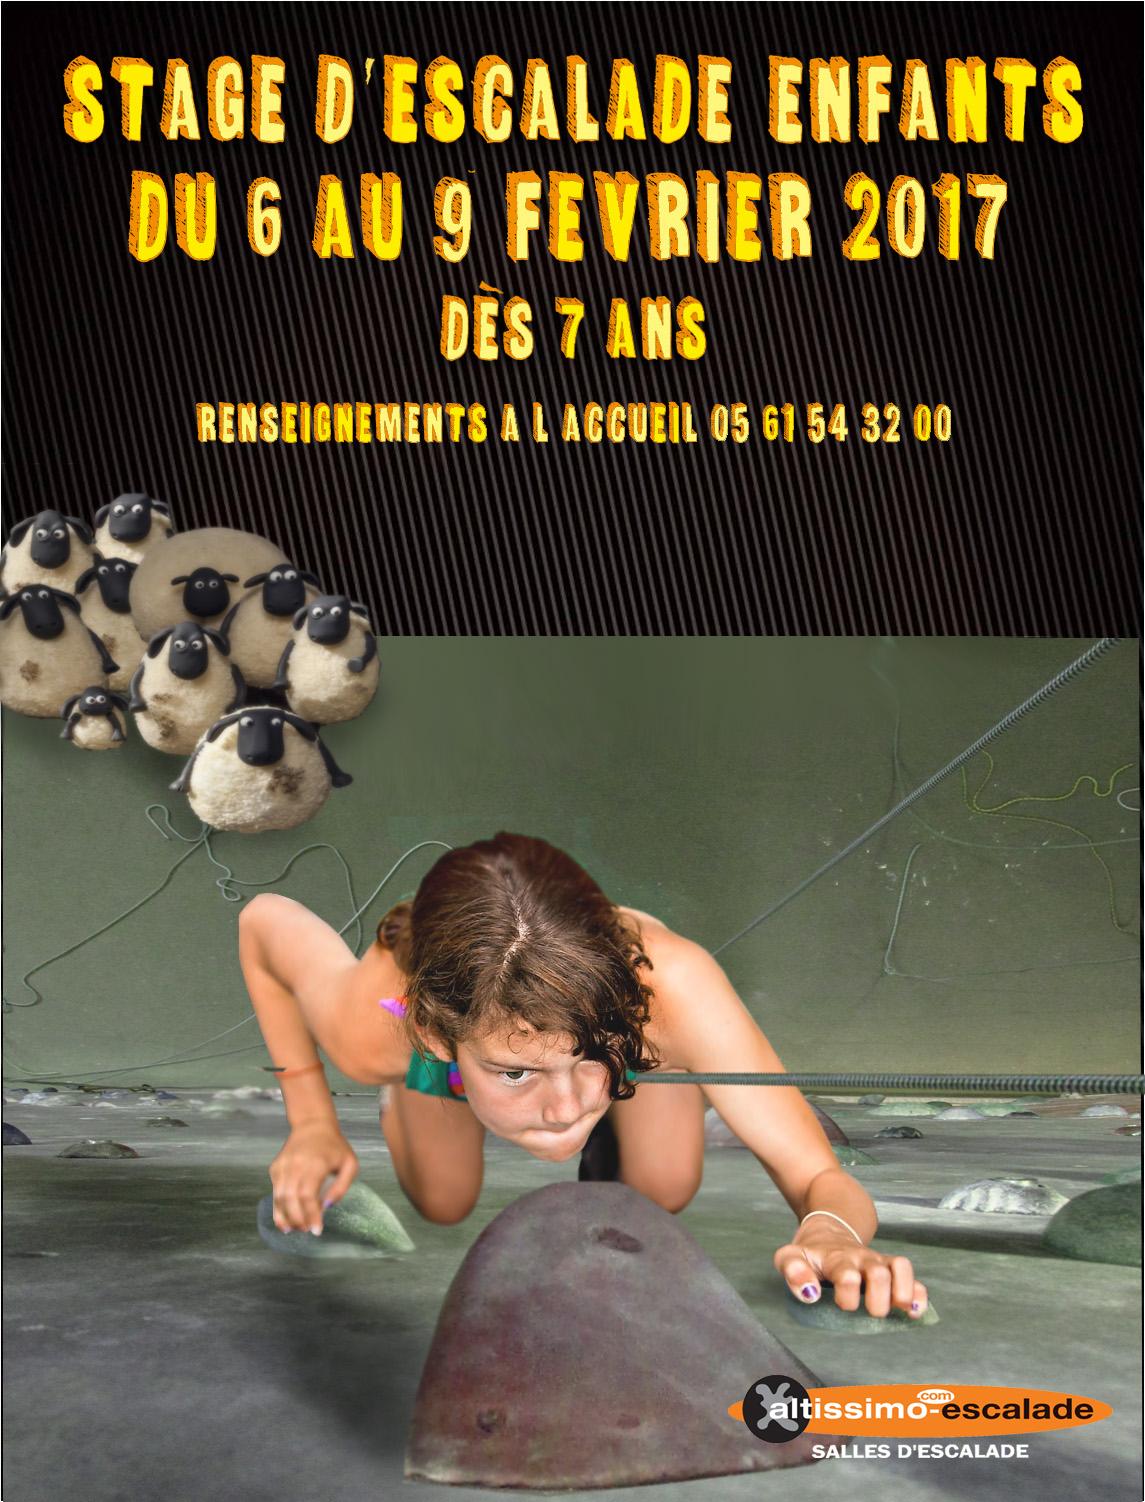 Altissimo montaudran stage escalade enfants - Vacances de fevrier paris 2017 ...